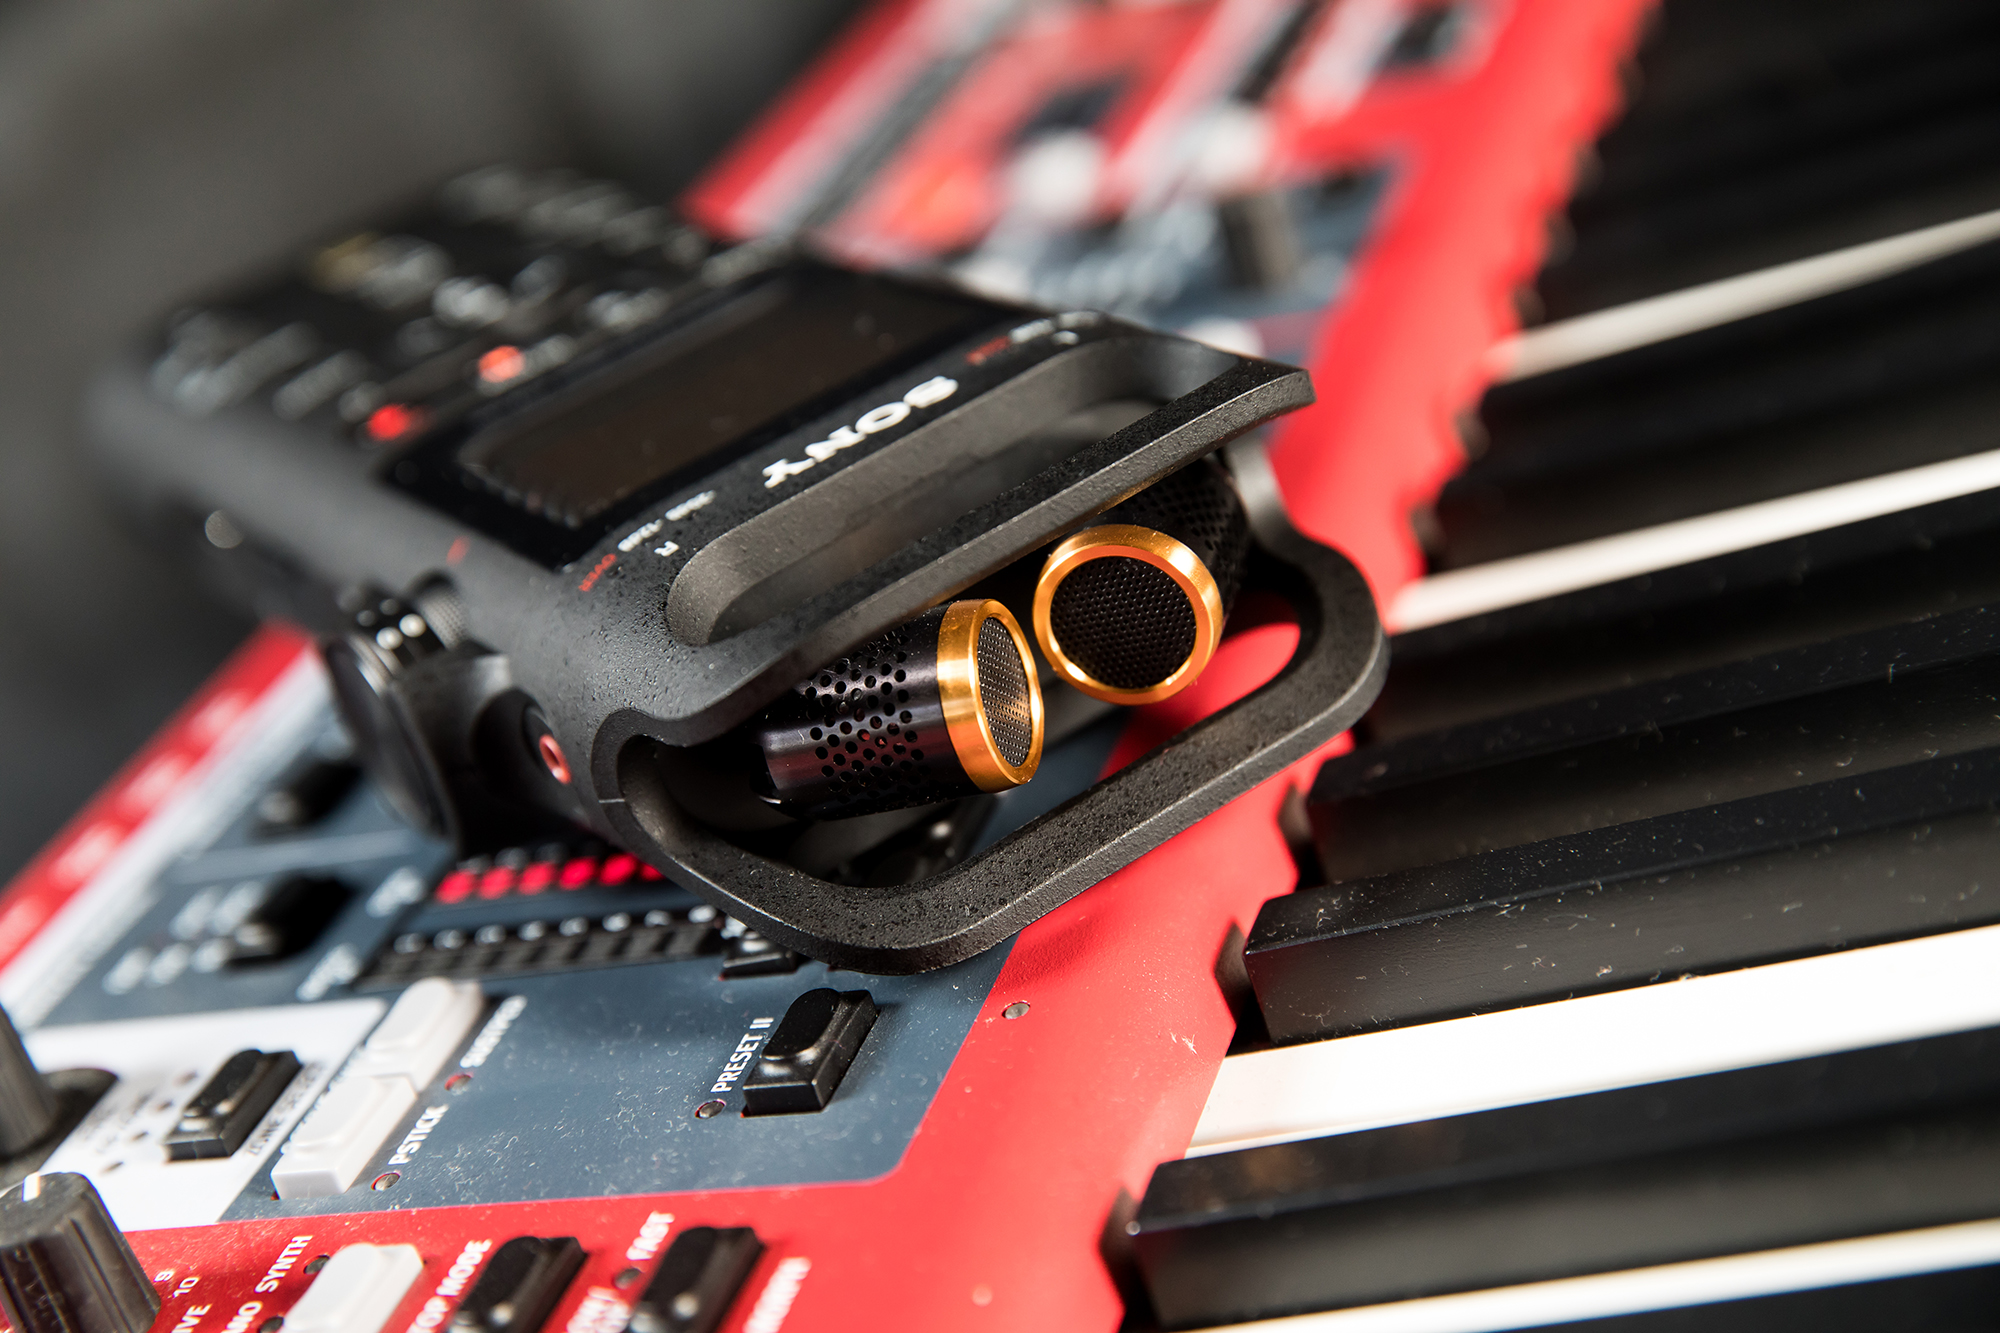 PCM-D10所�載的高感度可調式三向式內建麥克風,為音樂工作者提供了絕佳的錄製彈性。